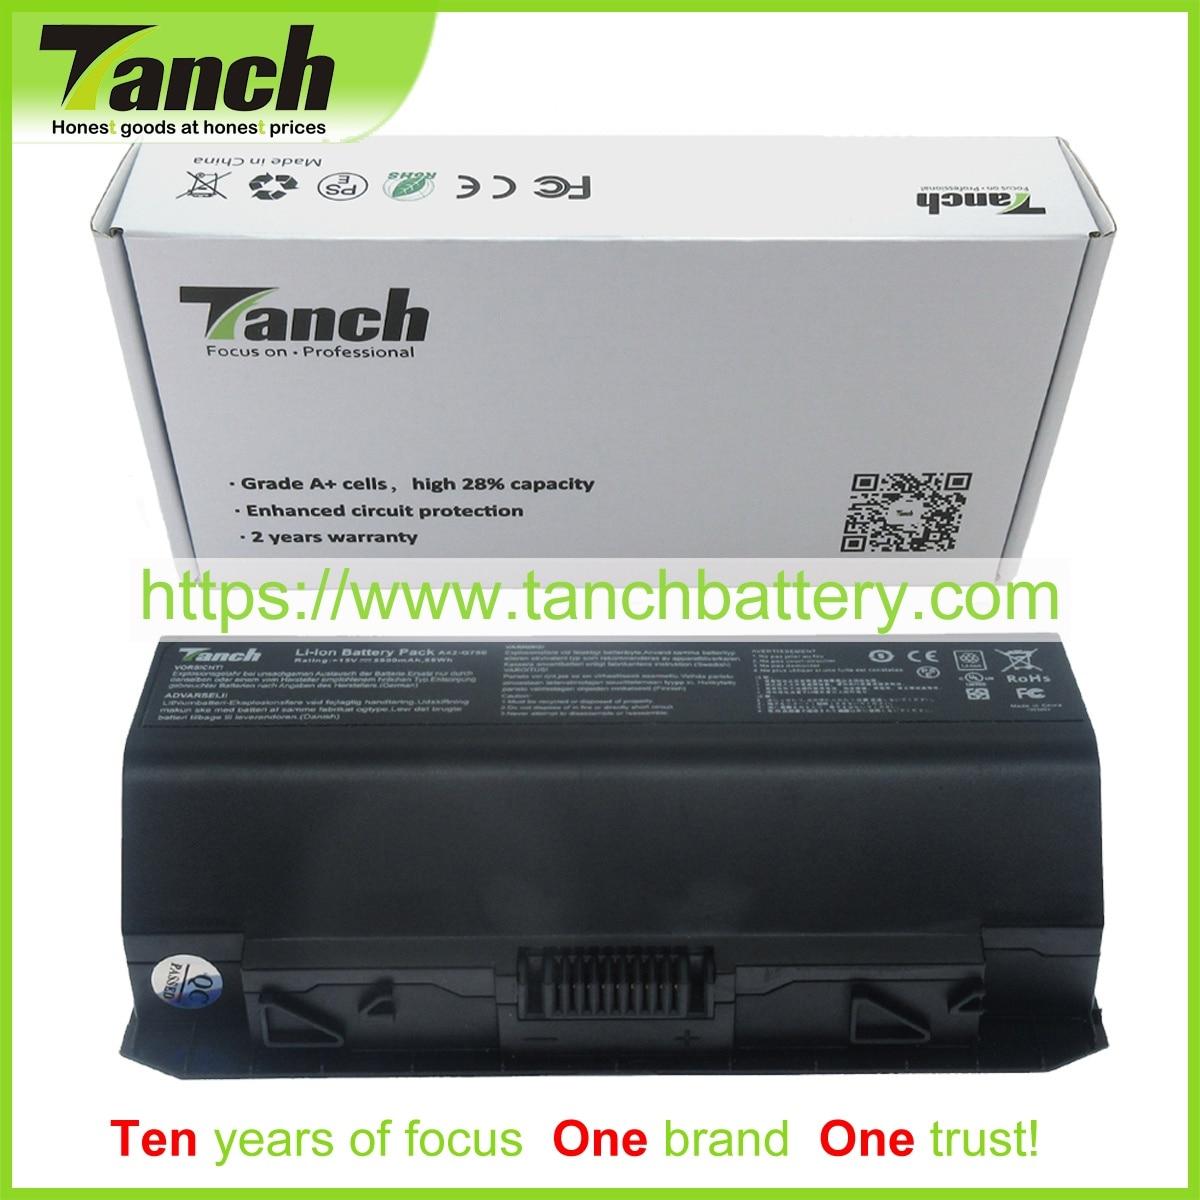 Tanch بطارية كمبيوتر محمول ل ASUS A42-G750 G750JX G750JW G750JZ G750JS G750JH-DB72 ROG G750JM GFX70JZ -BSI7N23 G750JY 15V 8 الخليوي